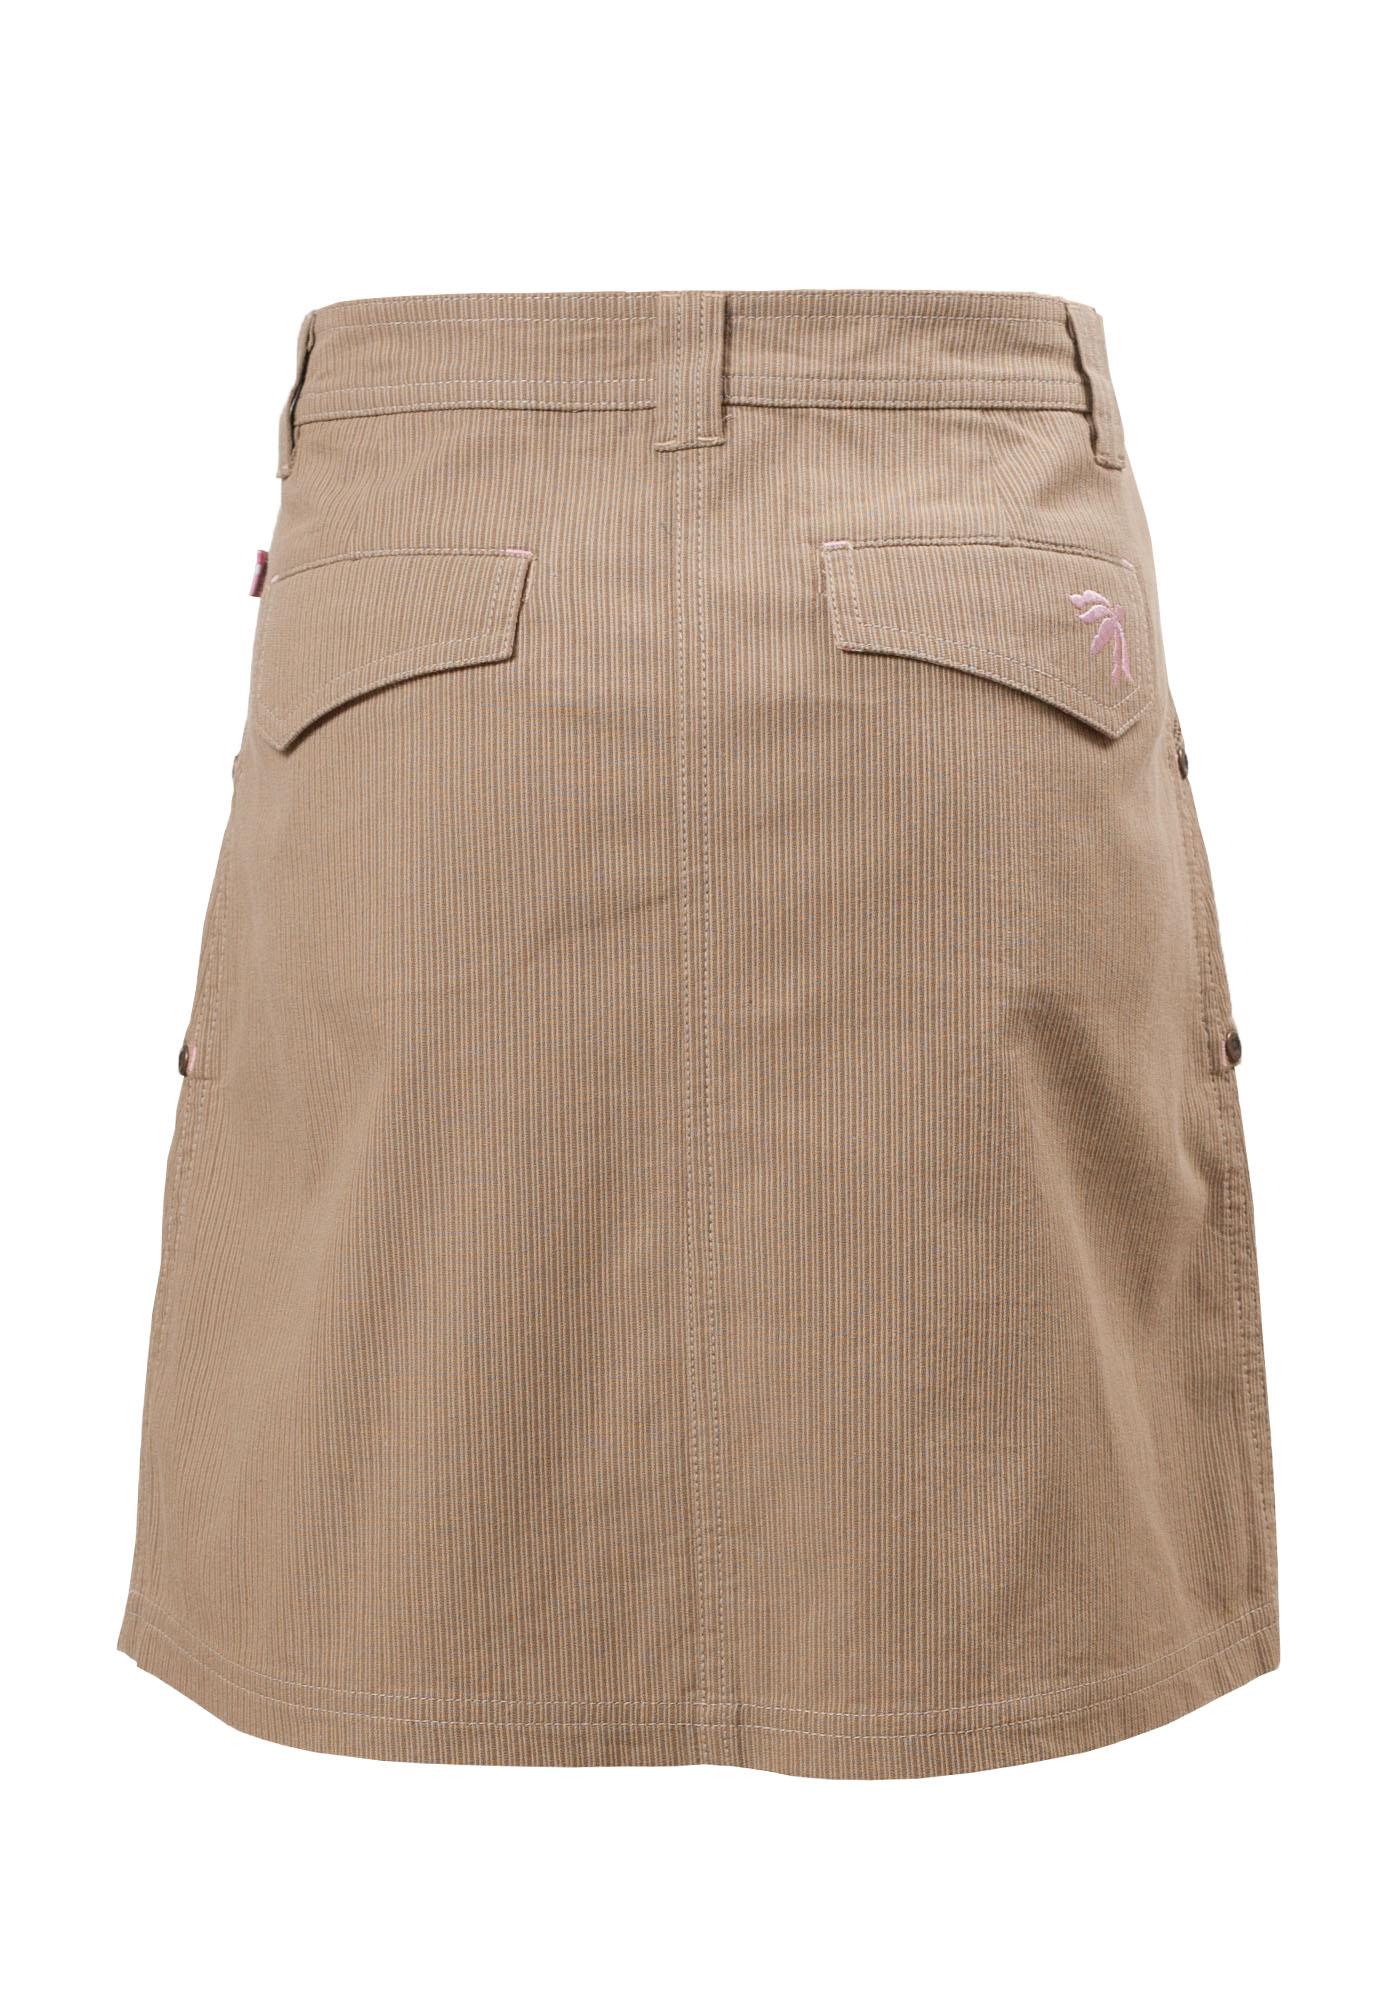 MINC Petite Autumn Fun Girls Embroidered Skirt in Beige Corduroy